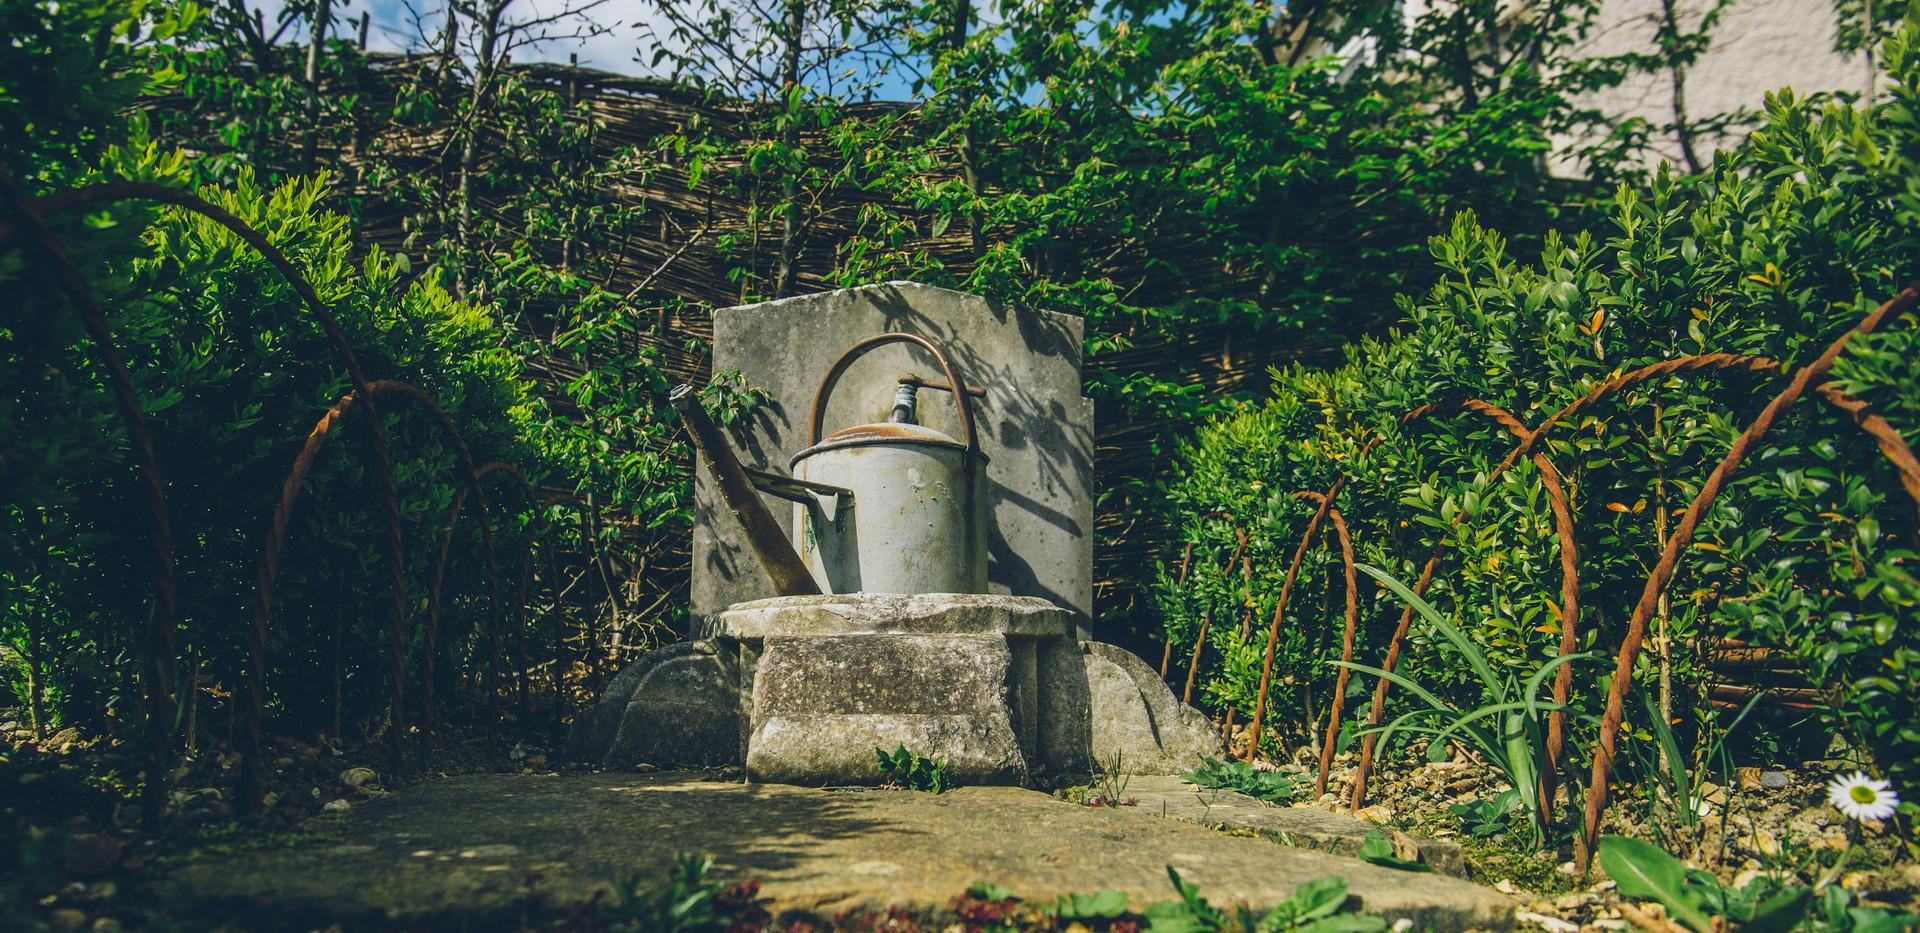 The Labyrinth Garden